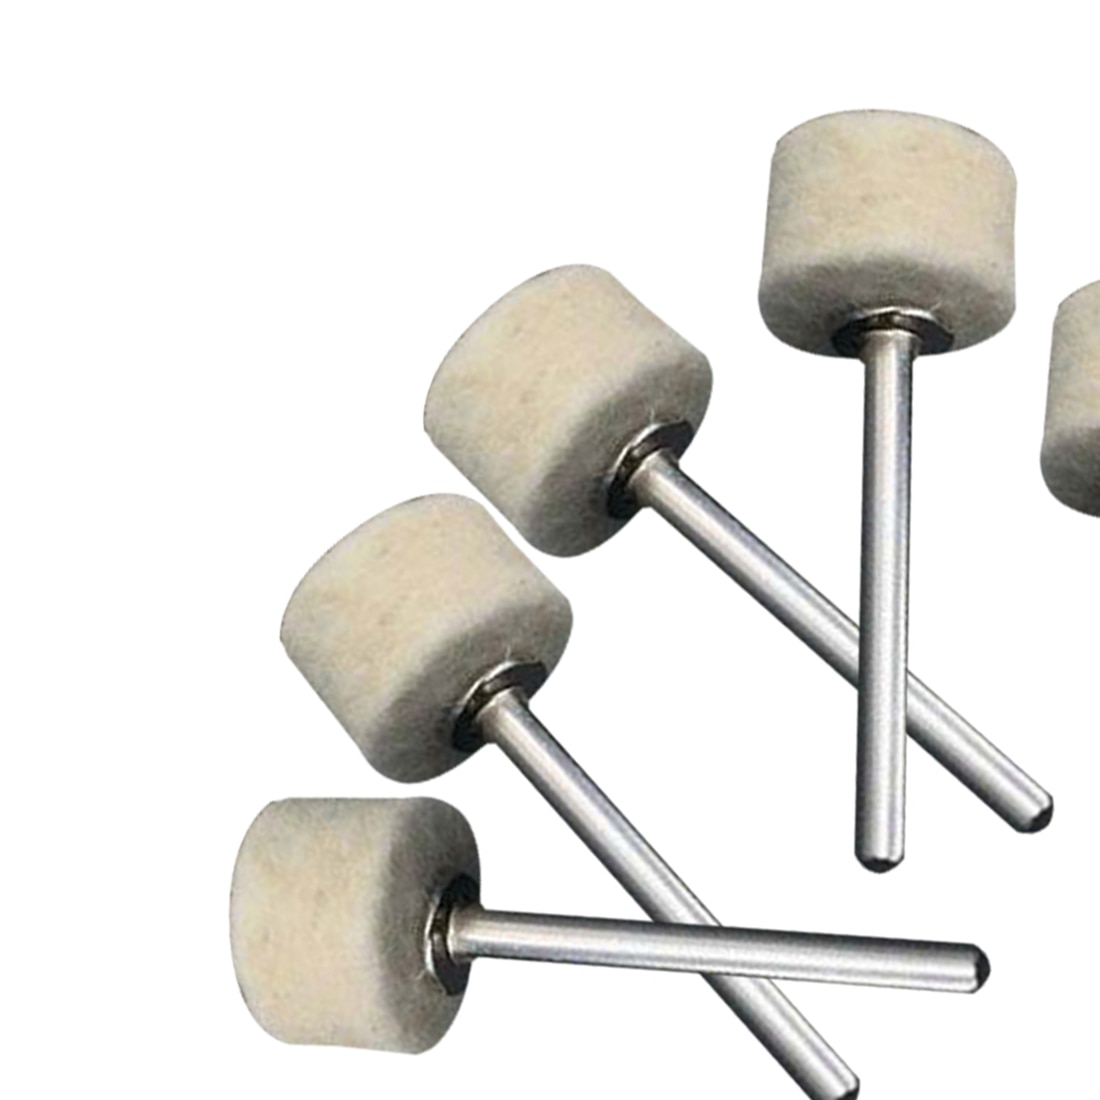 50Pcs 13mm Wool Felt Polishing Buffing Wheel La rueda de rueda de moler+2Pcs 3.2 mm Shanks for Rotary Tool Accessories недорого